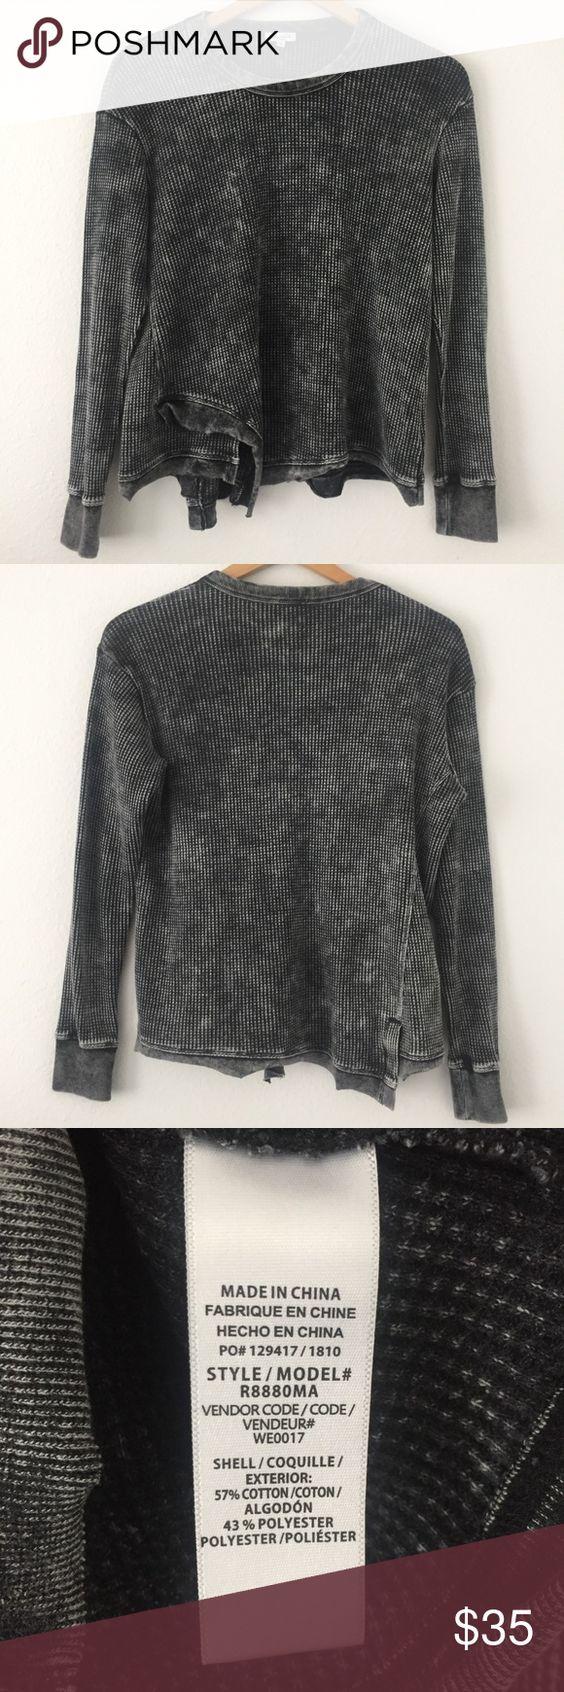 Splendid Aurora Waffle Knit Sweatshirt Thermal Knit Sweatshirt Waffle Knit Clothes Design [ 1692 x 564 Pixel ]